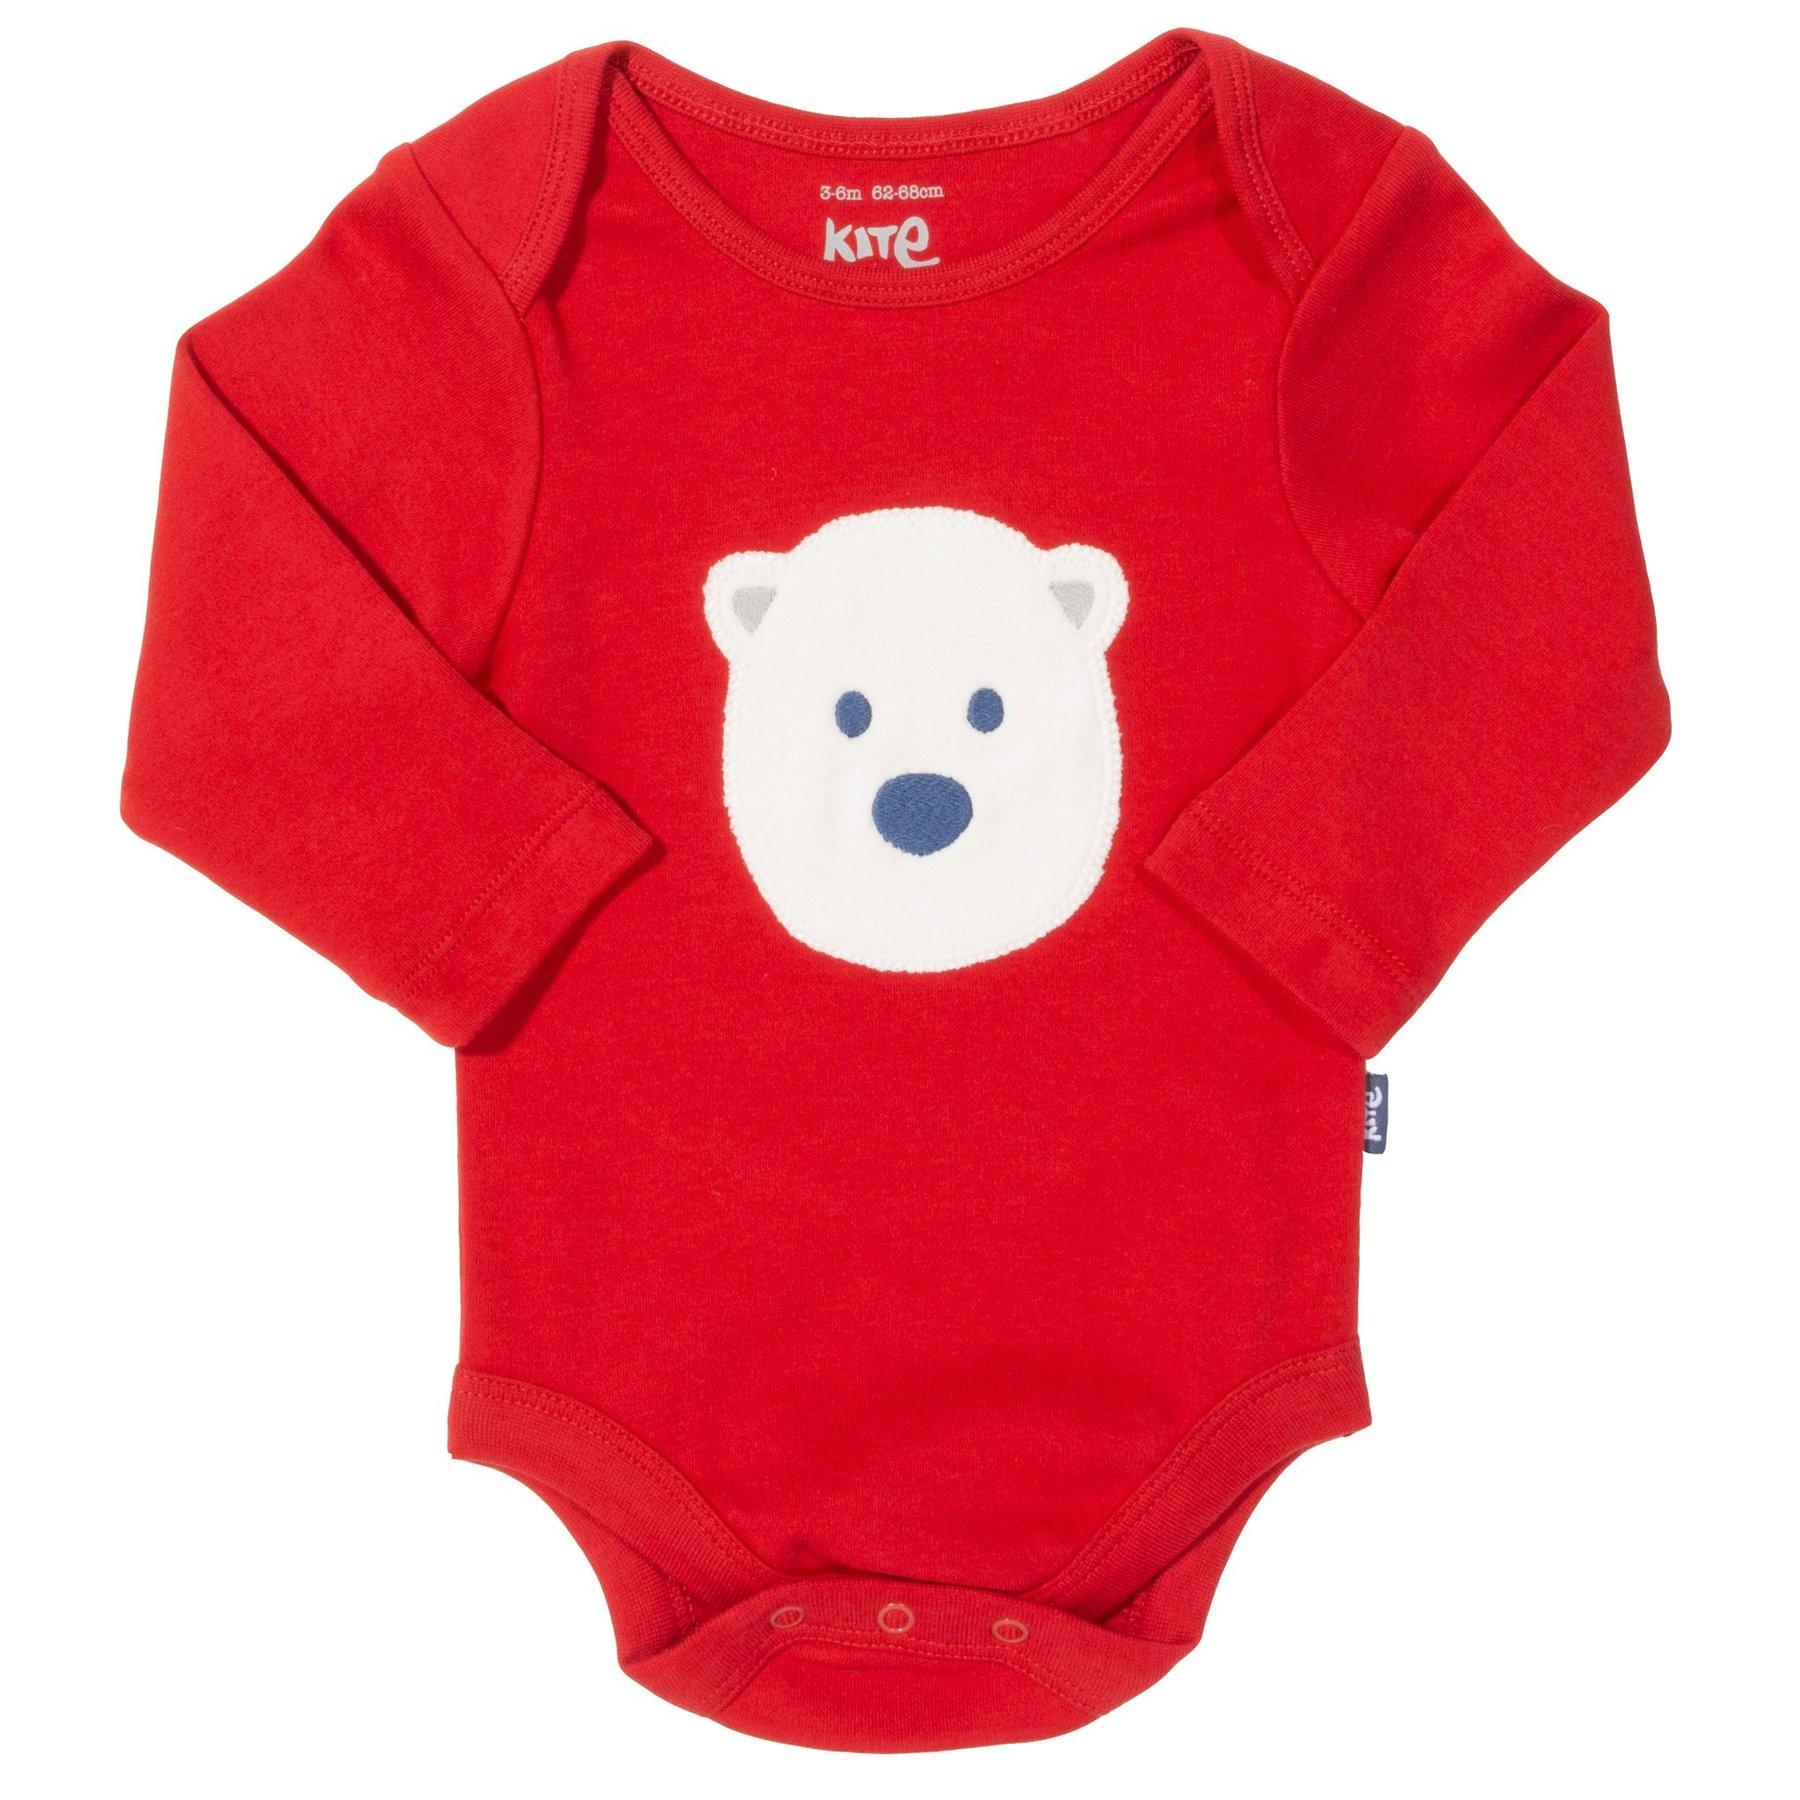 Kite Snow Bear Bodysuit - Red (was £14.00)